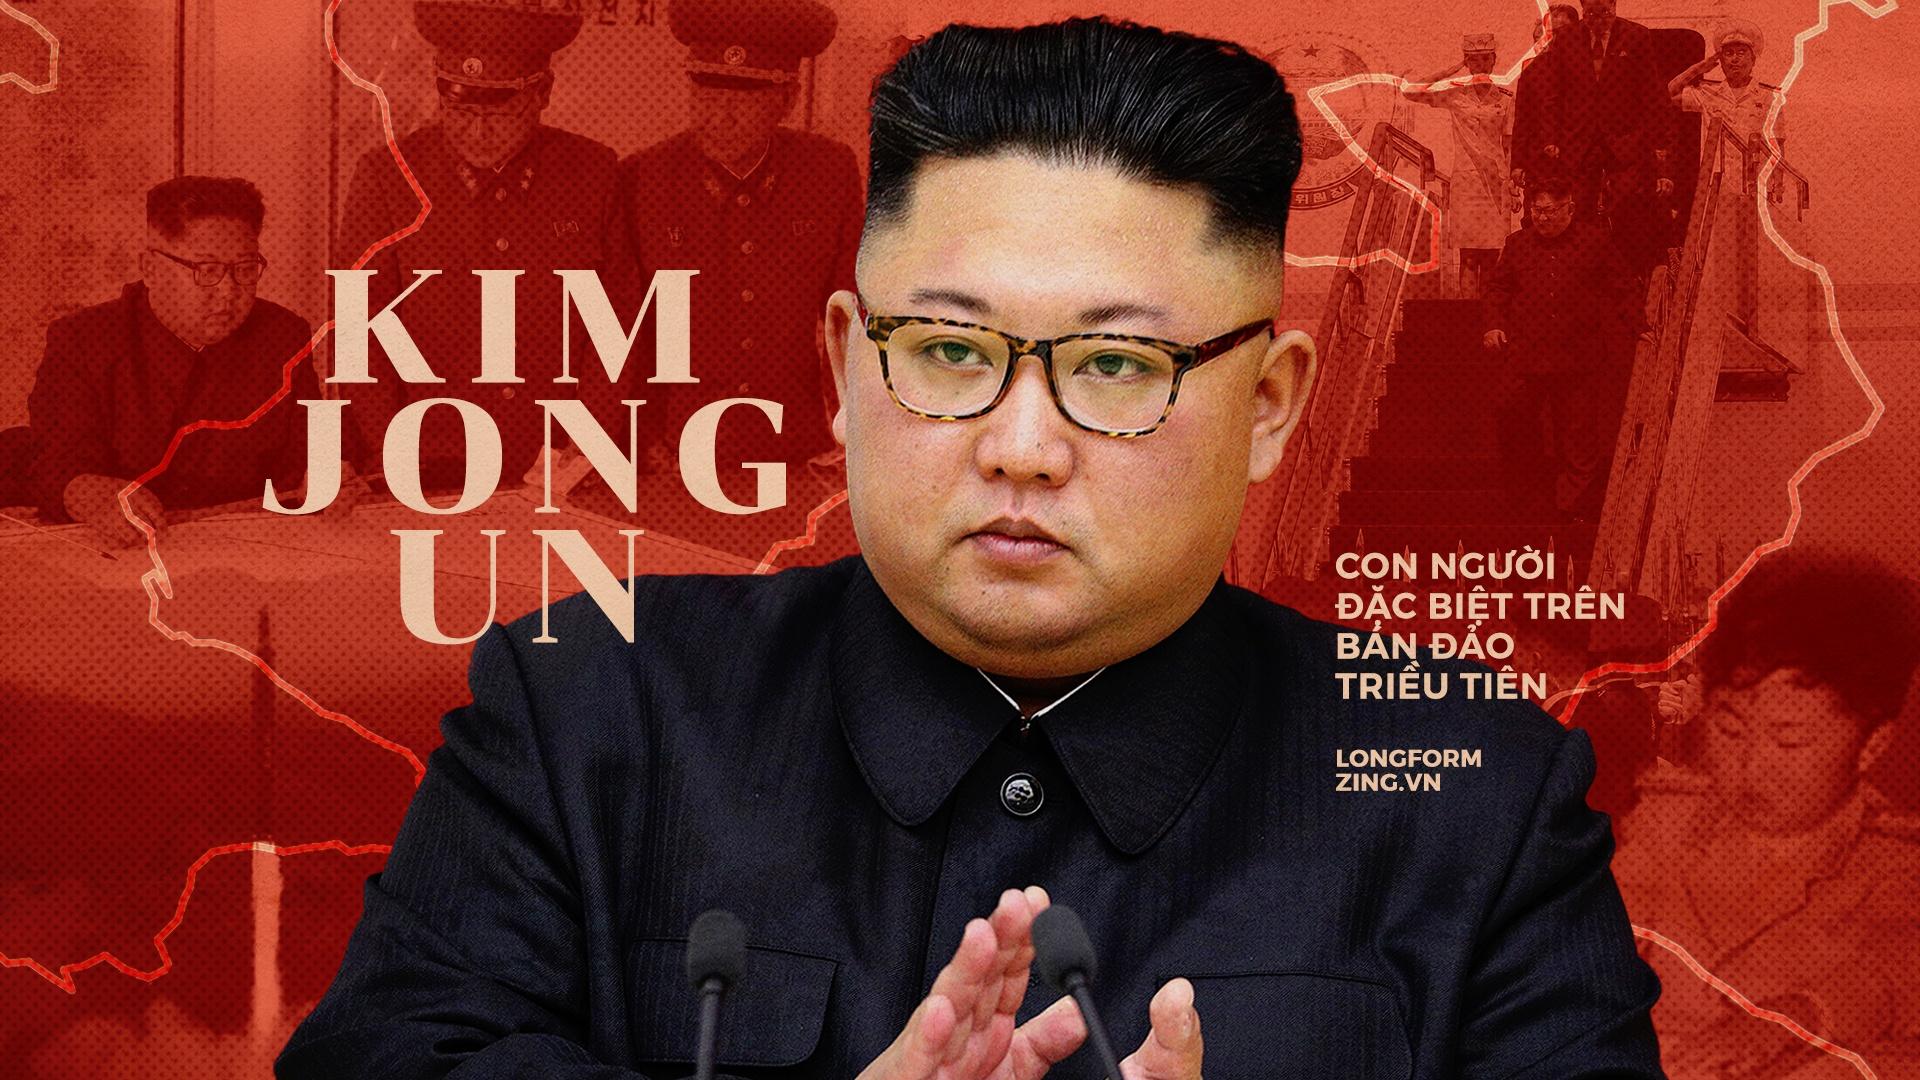 Kim Jong Un dac biet anh 2